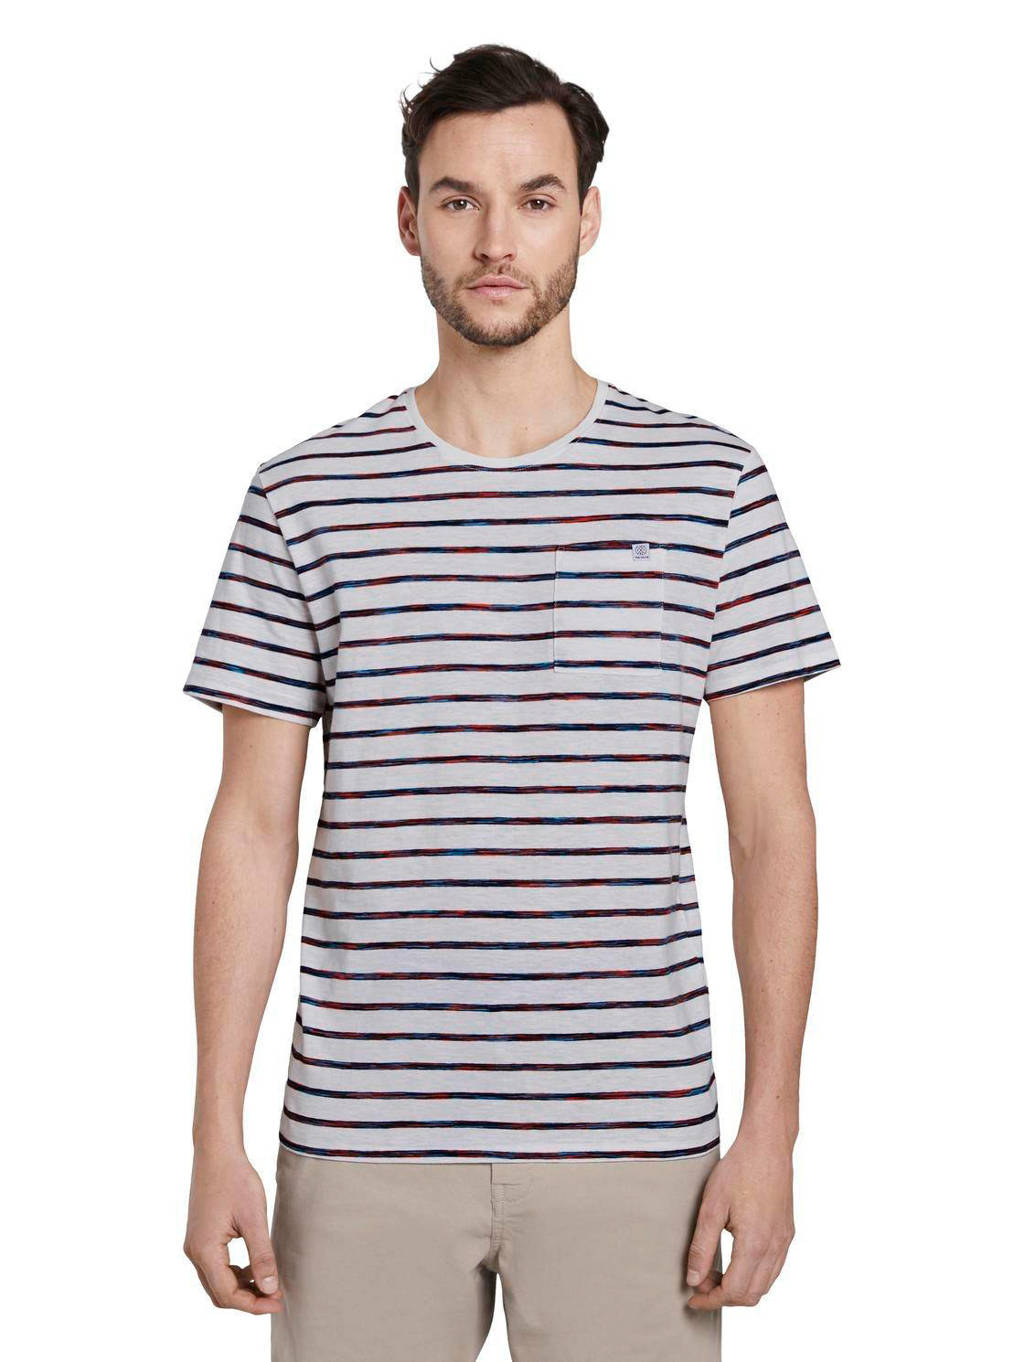 Tom Tailor gestreept T-shirt wit, Wit/antraciet